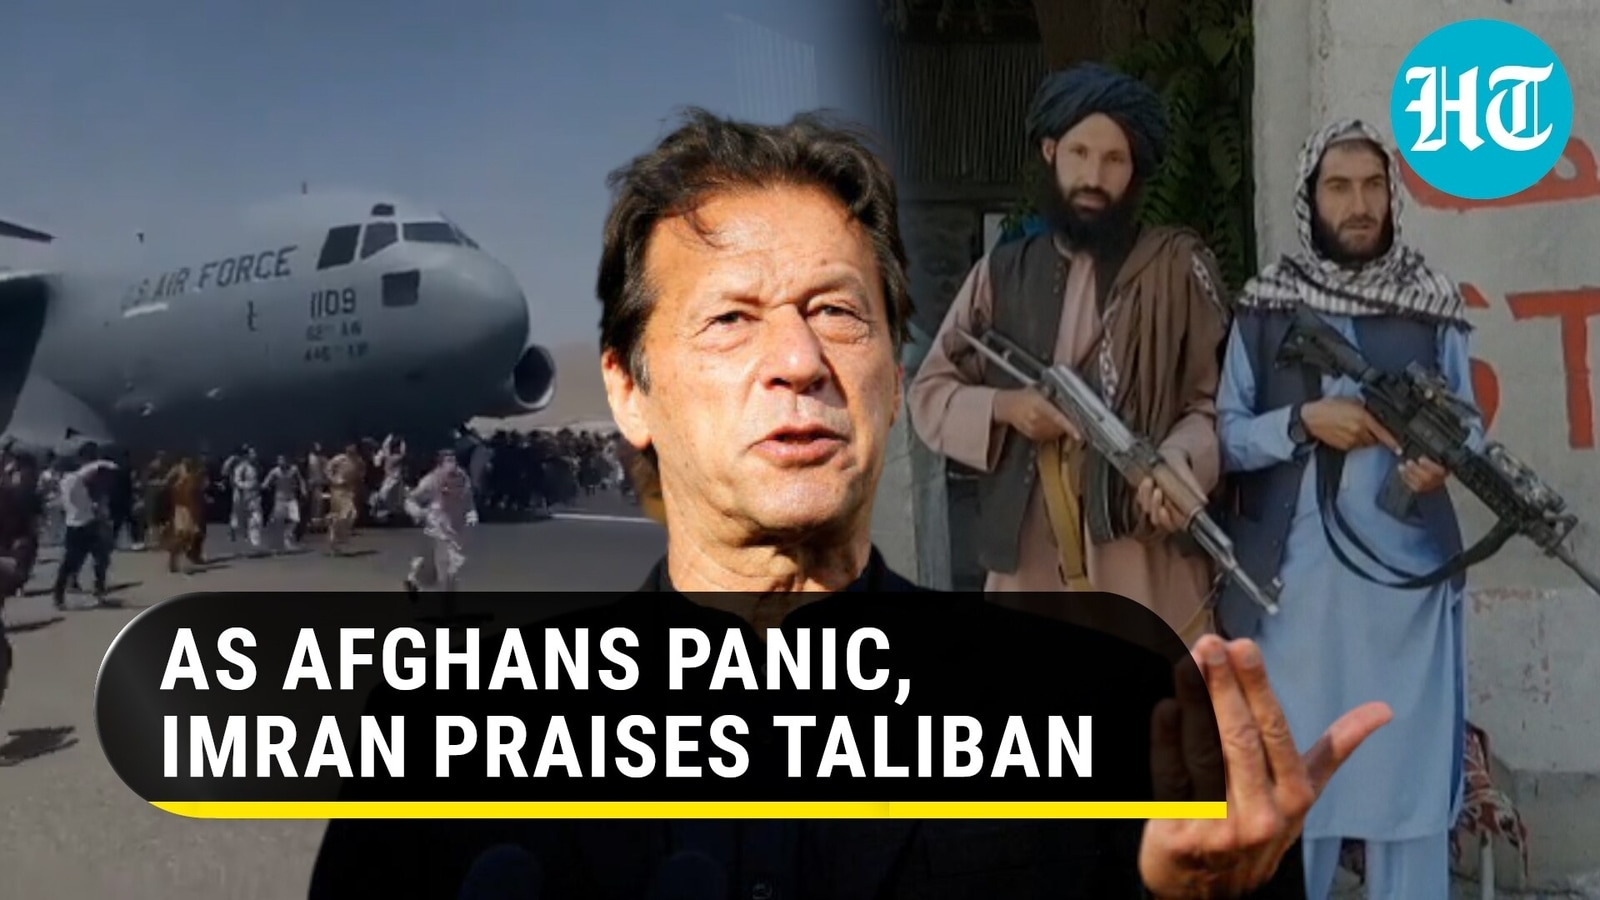 Imran Khan praises Taliban takeover, calls it 'breaking chains of slavery' - HuntDailyNews.in